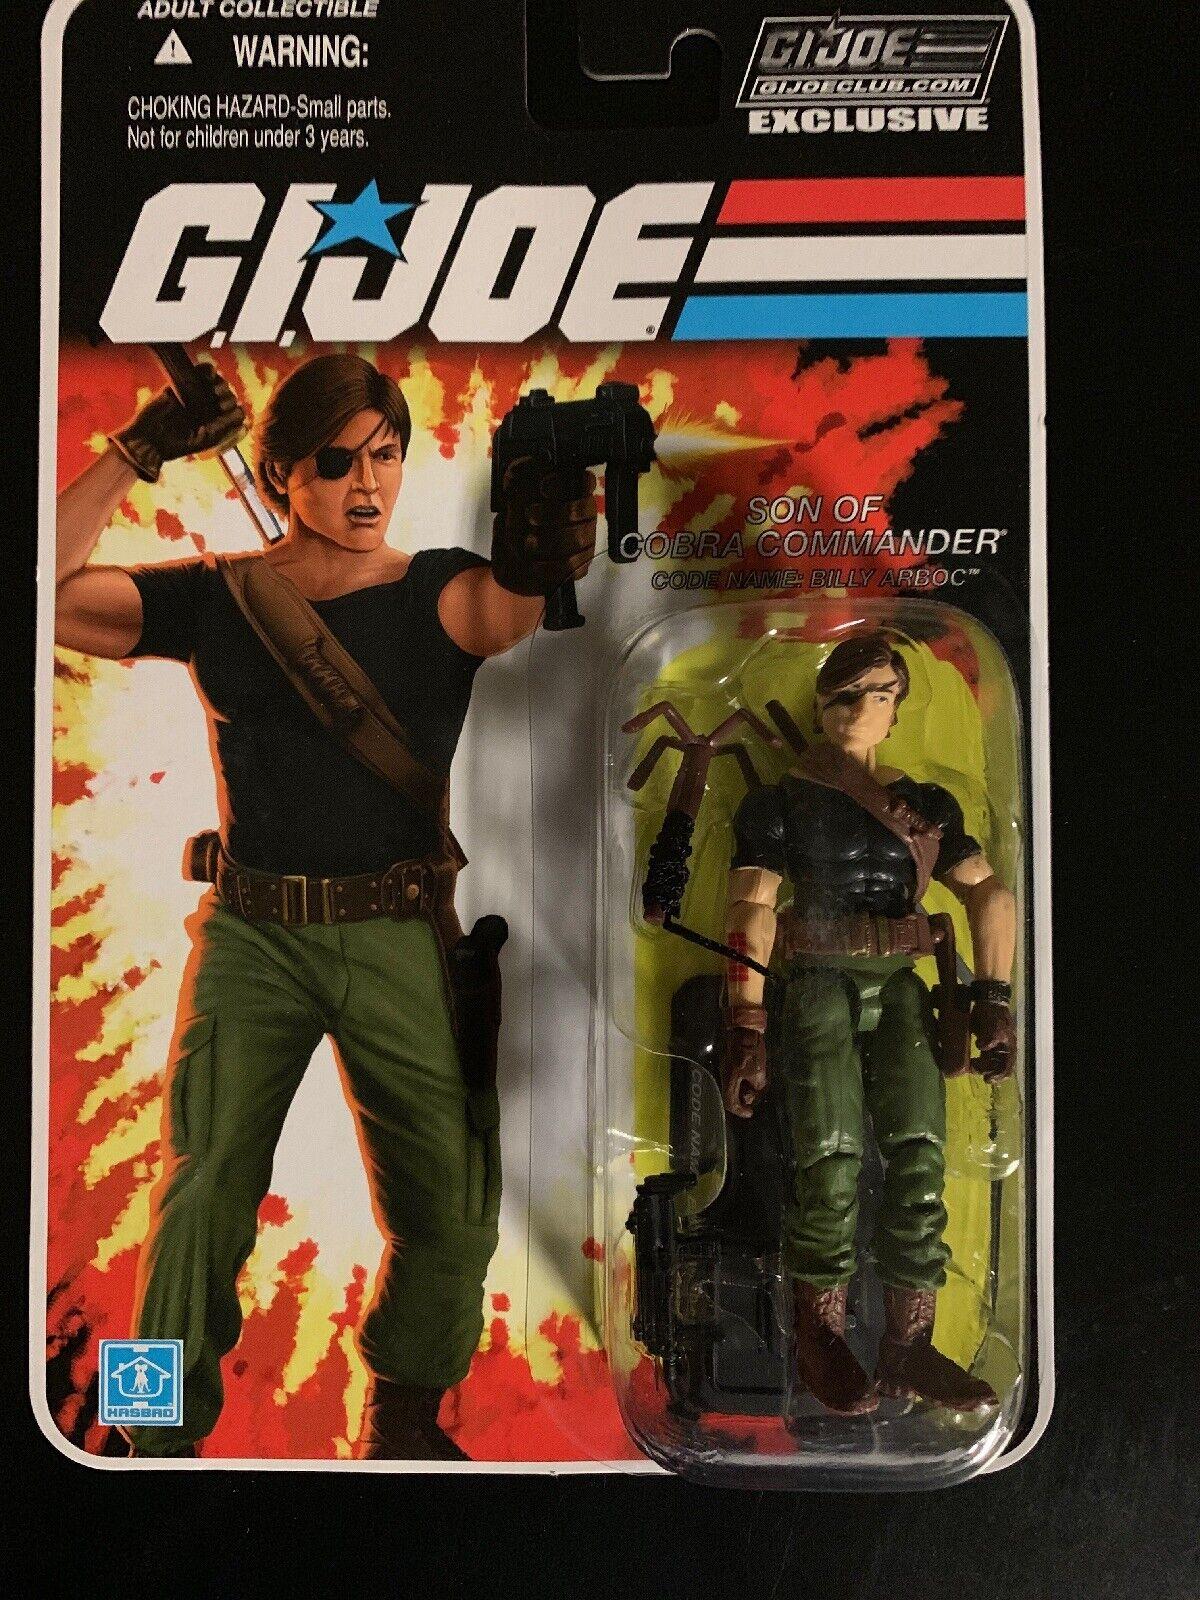 GI JOE FSS 4.0 09 Billy Arboc Son of Cobra Commander MISP